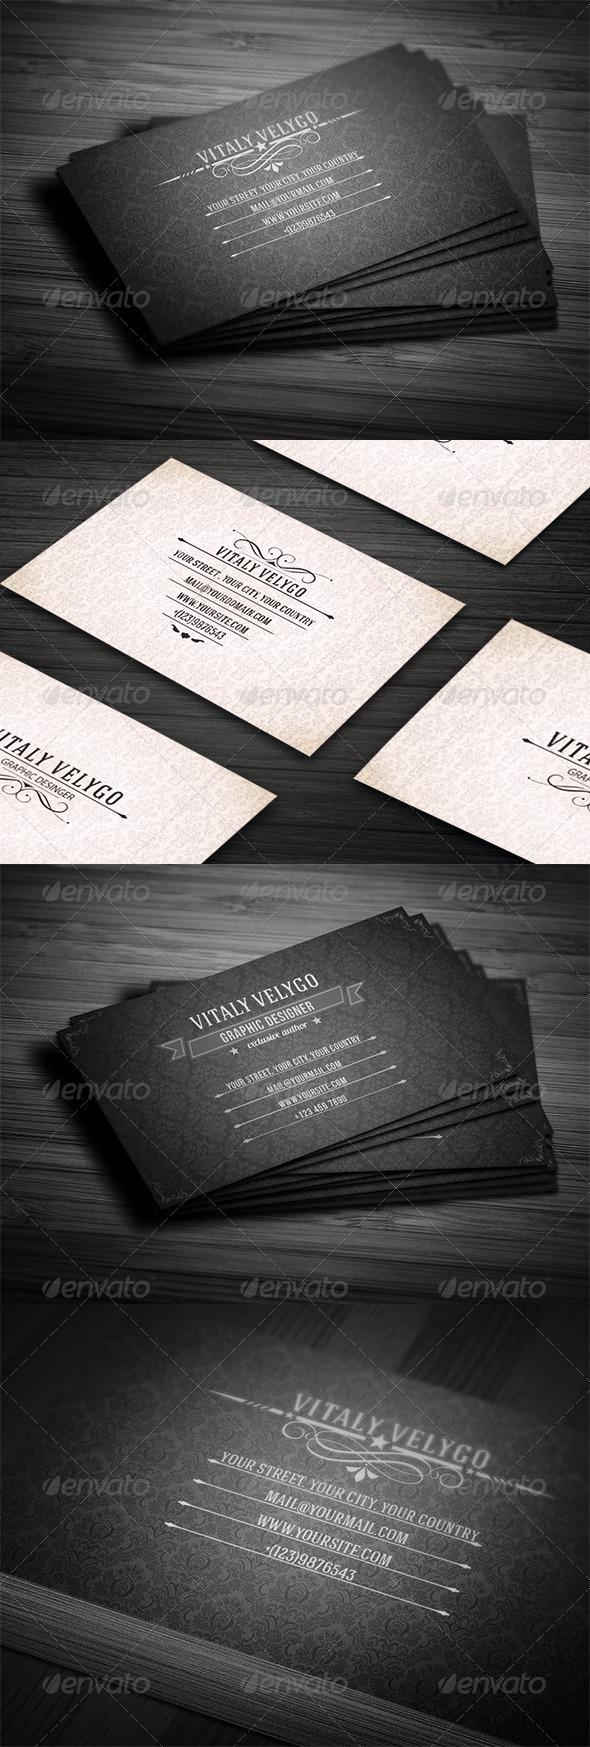 GraphicRiver Vintage Business Card Bundle 3 in 1 3448800